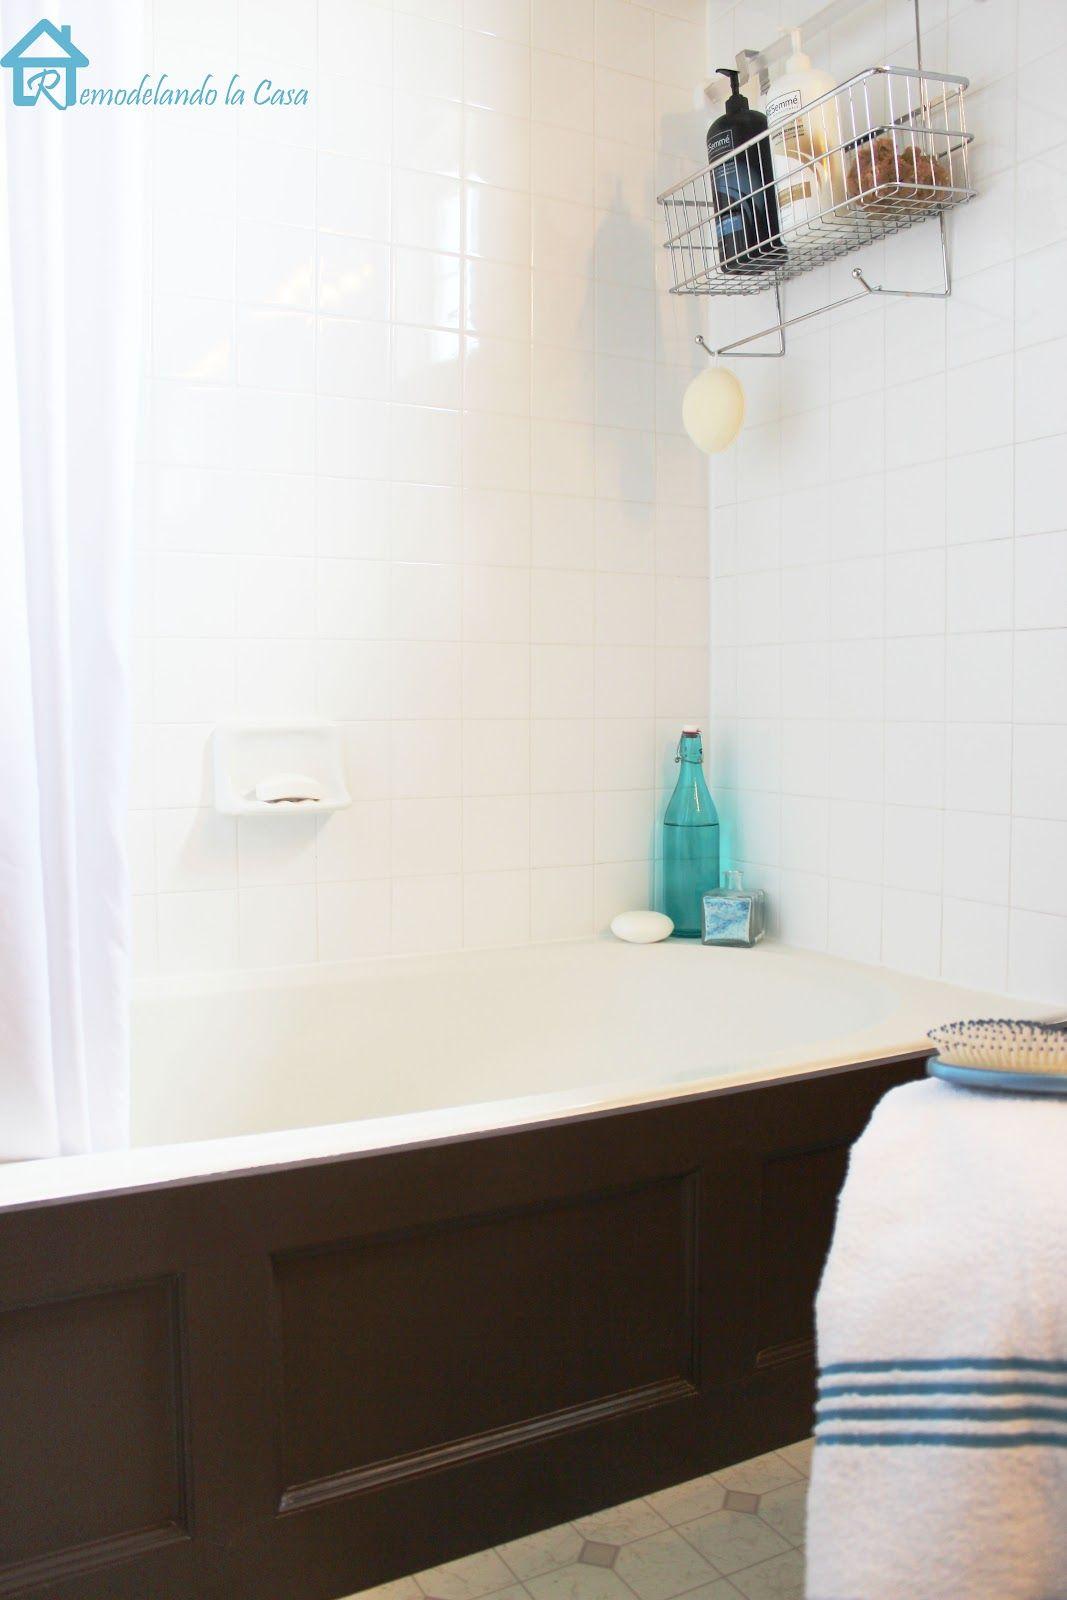 Bathtub Wood Panel Cover | Pinterest | Bathtubs, Woods and Bathtub cover